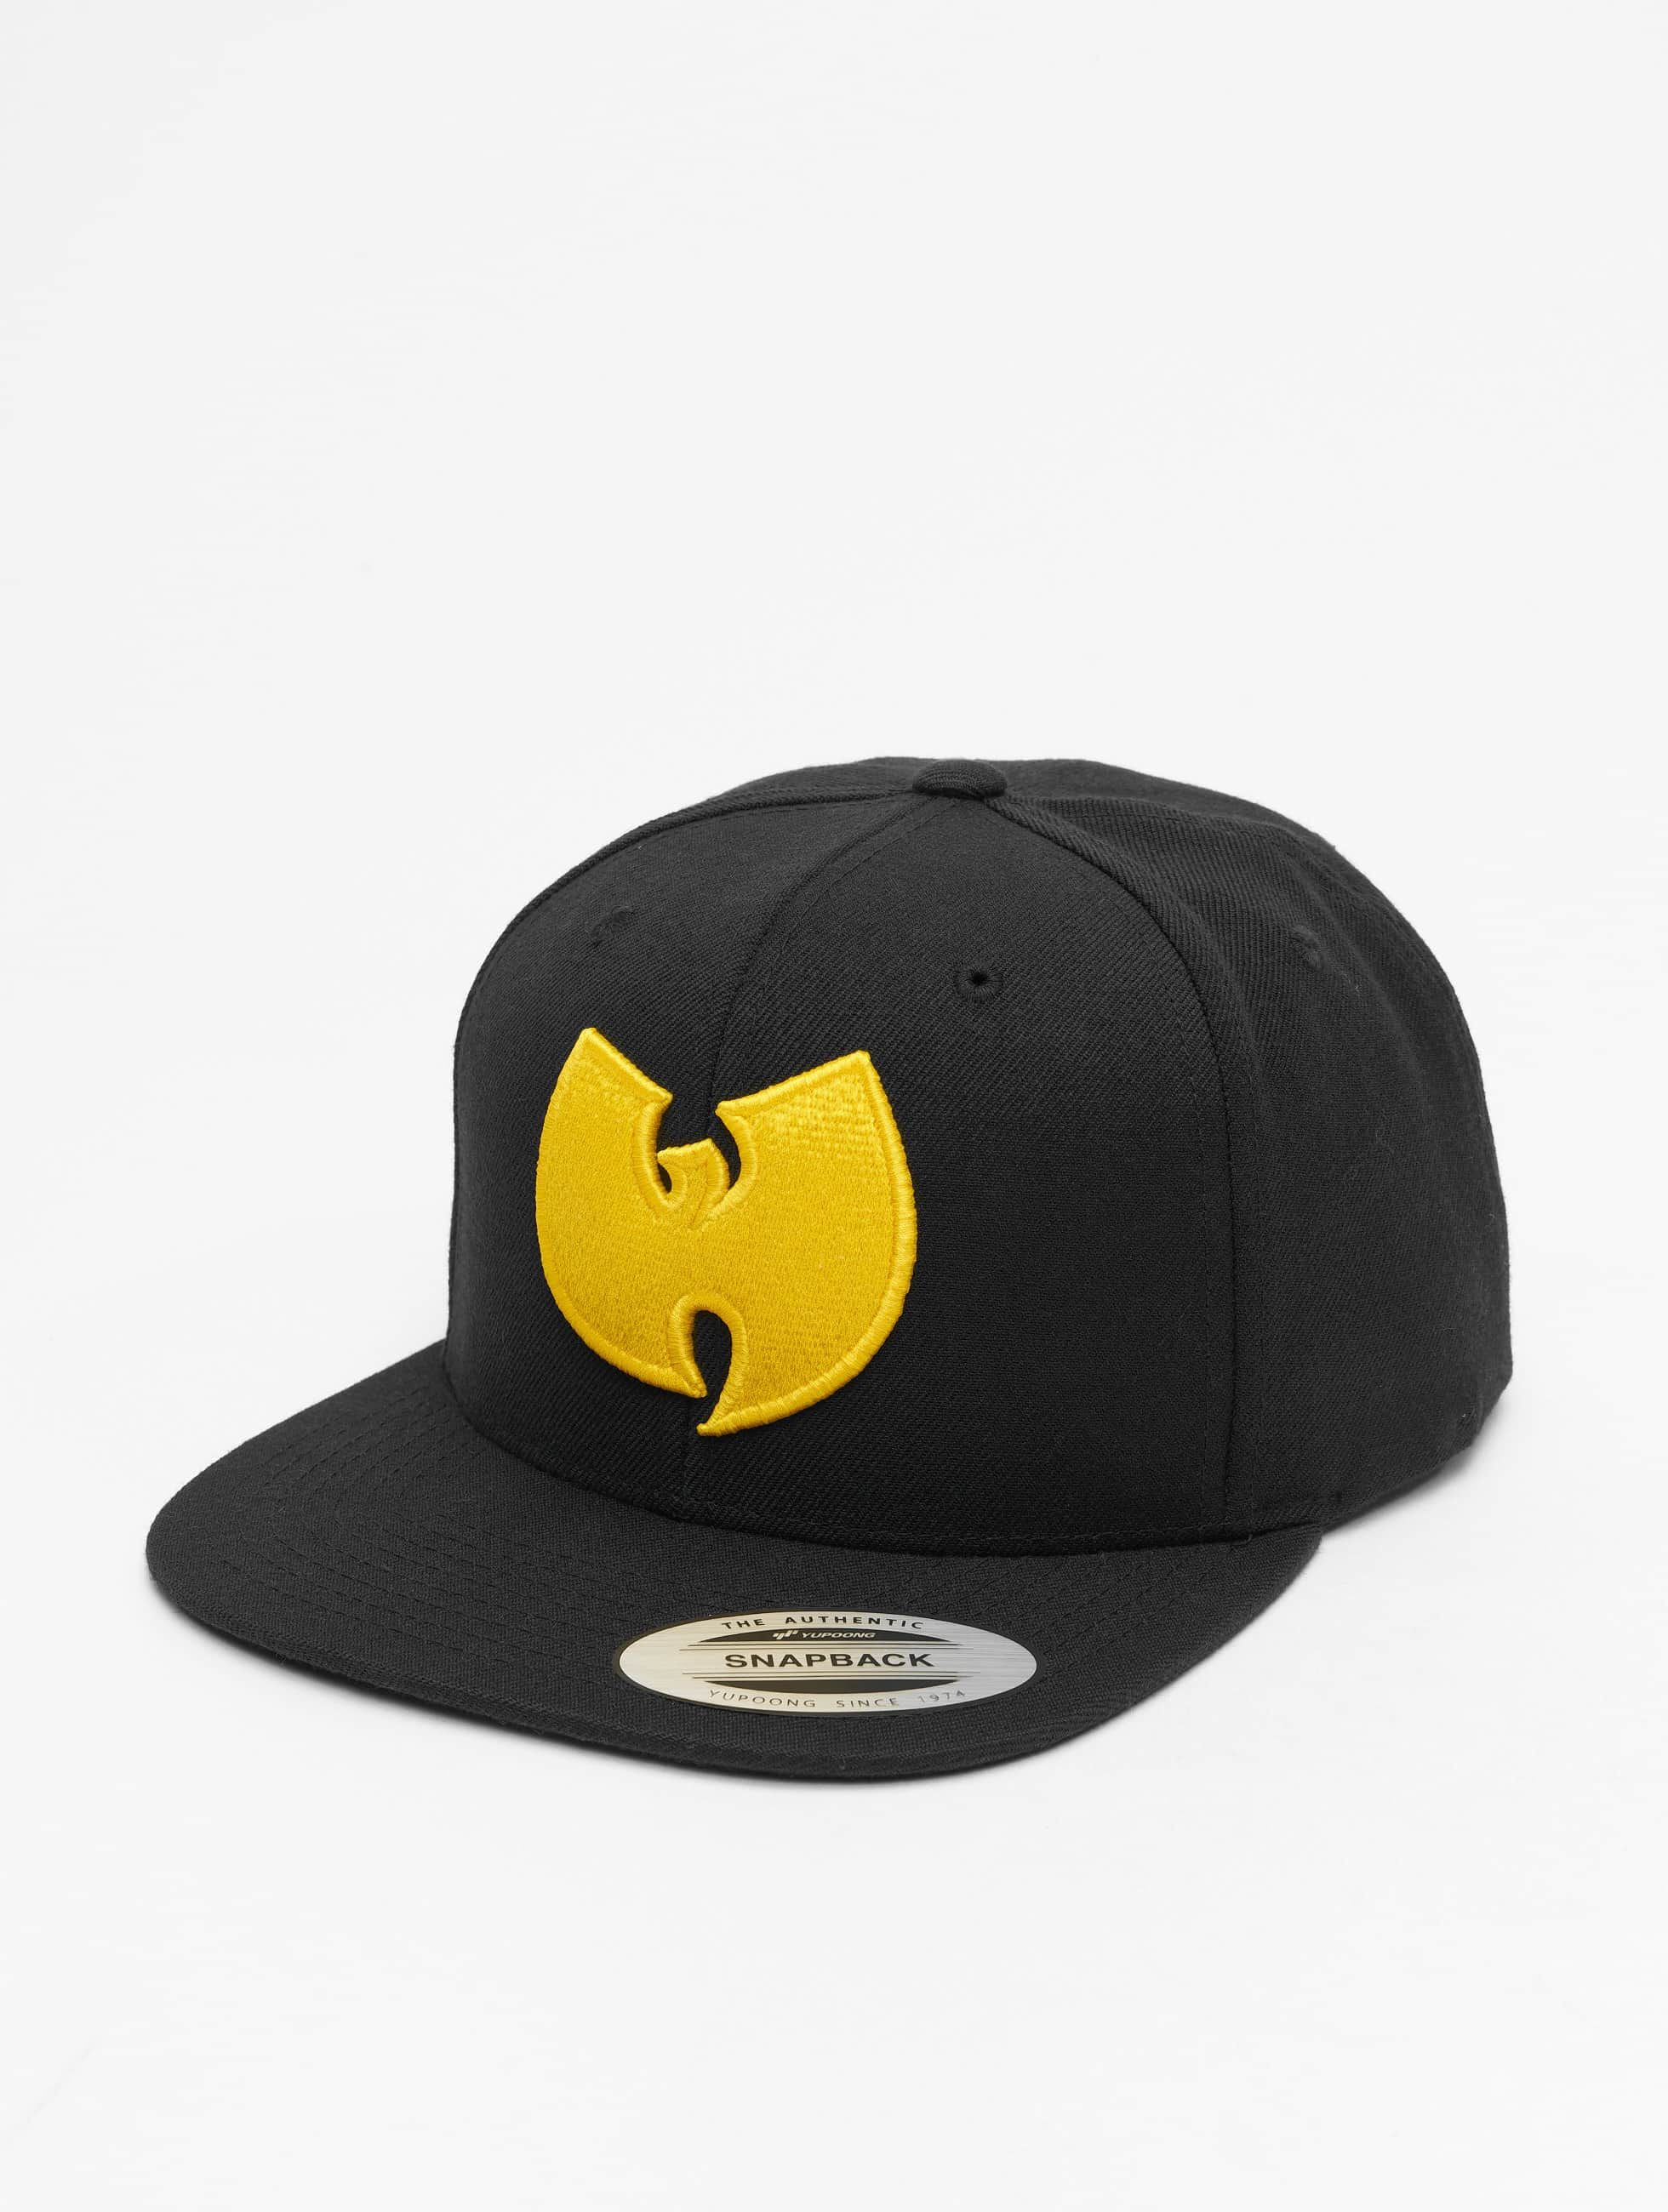 Wu-Tang Männer,Frauen Snapback Cap Logo in schwarz